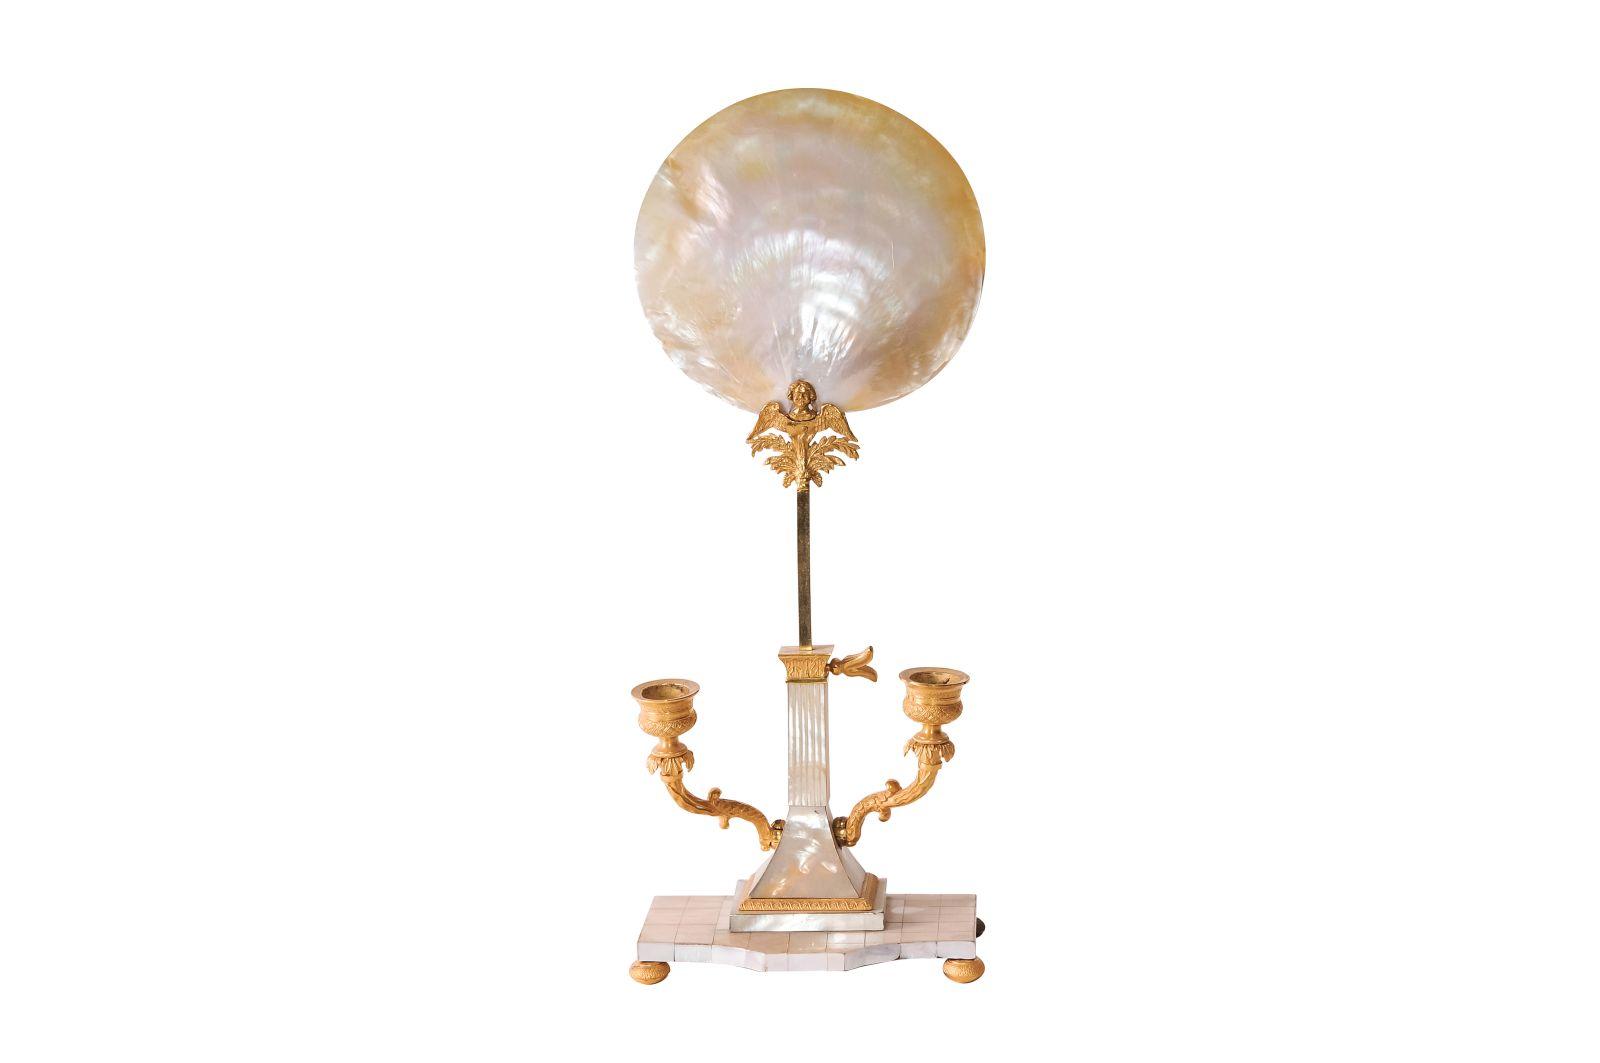 #132 Nacre candle chandelier 1820 | Perlmutt Kerzenleuchter 1820 Image